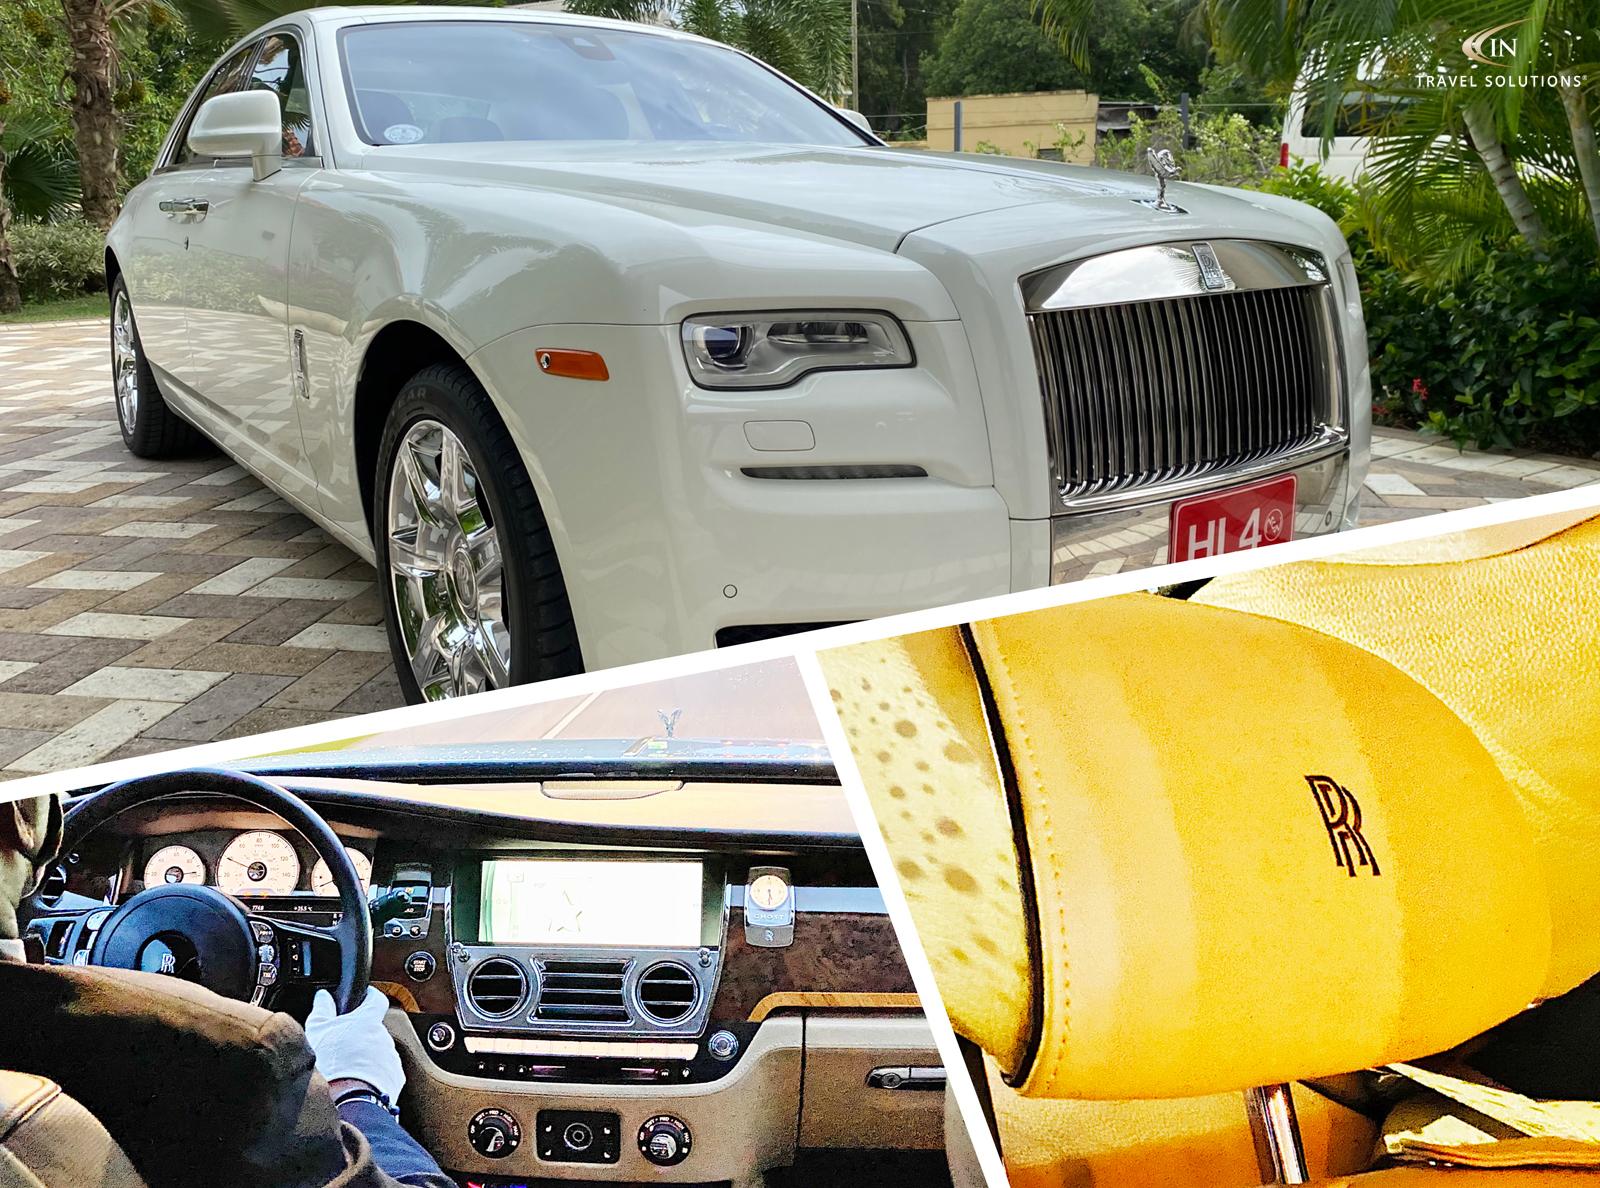 Sandals Royal Barbados - Rolls-Royce Transfer